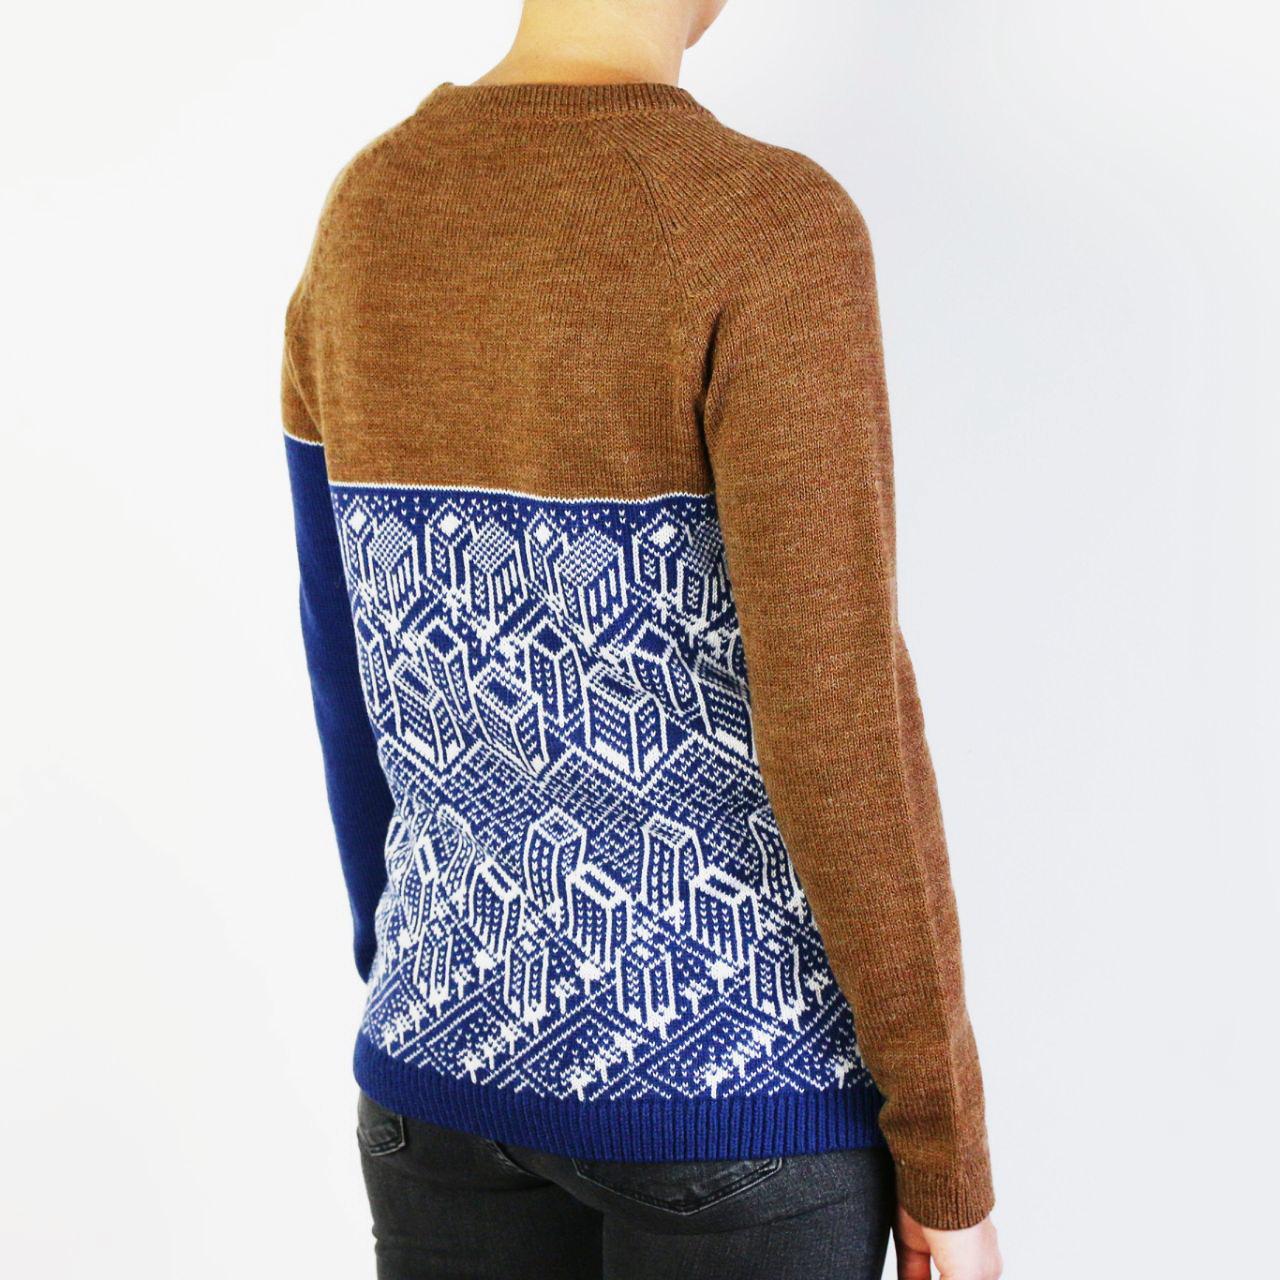 wool sweater mekoome urban 2n 2